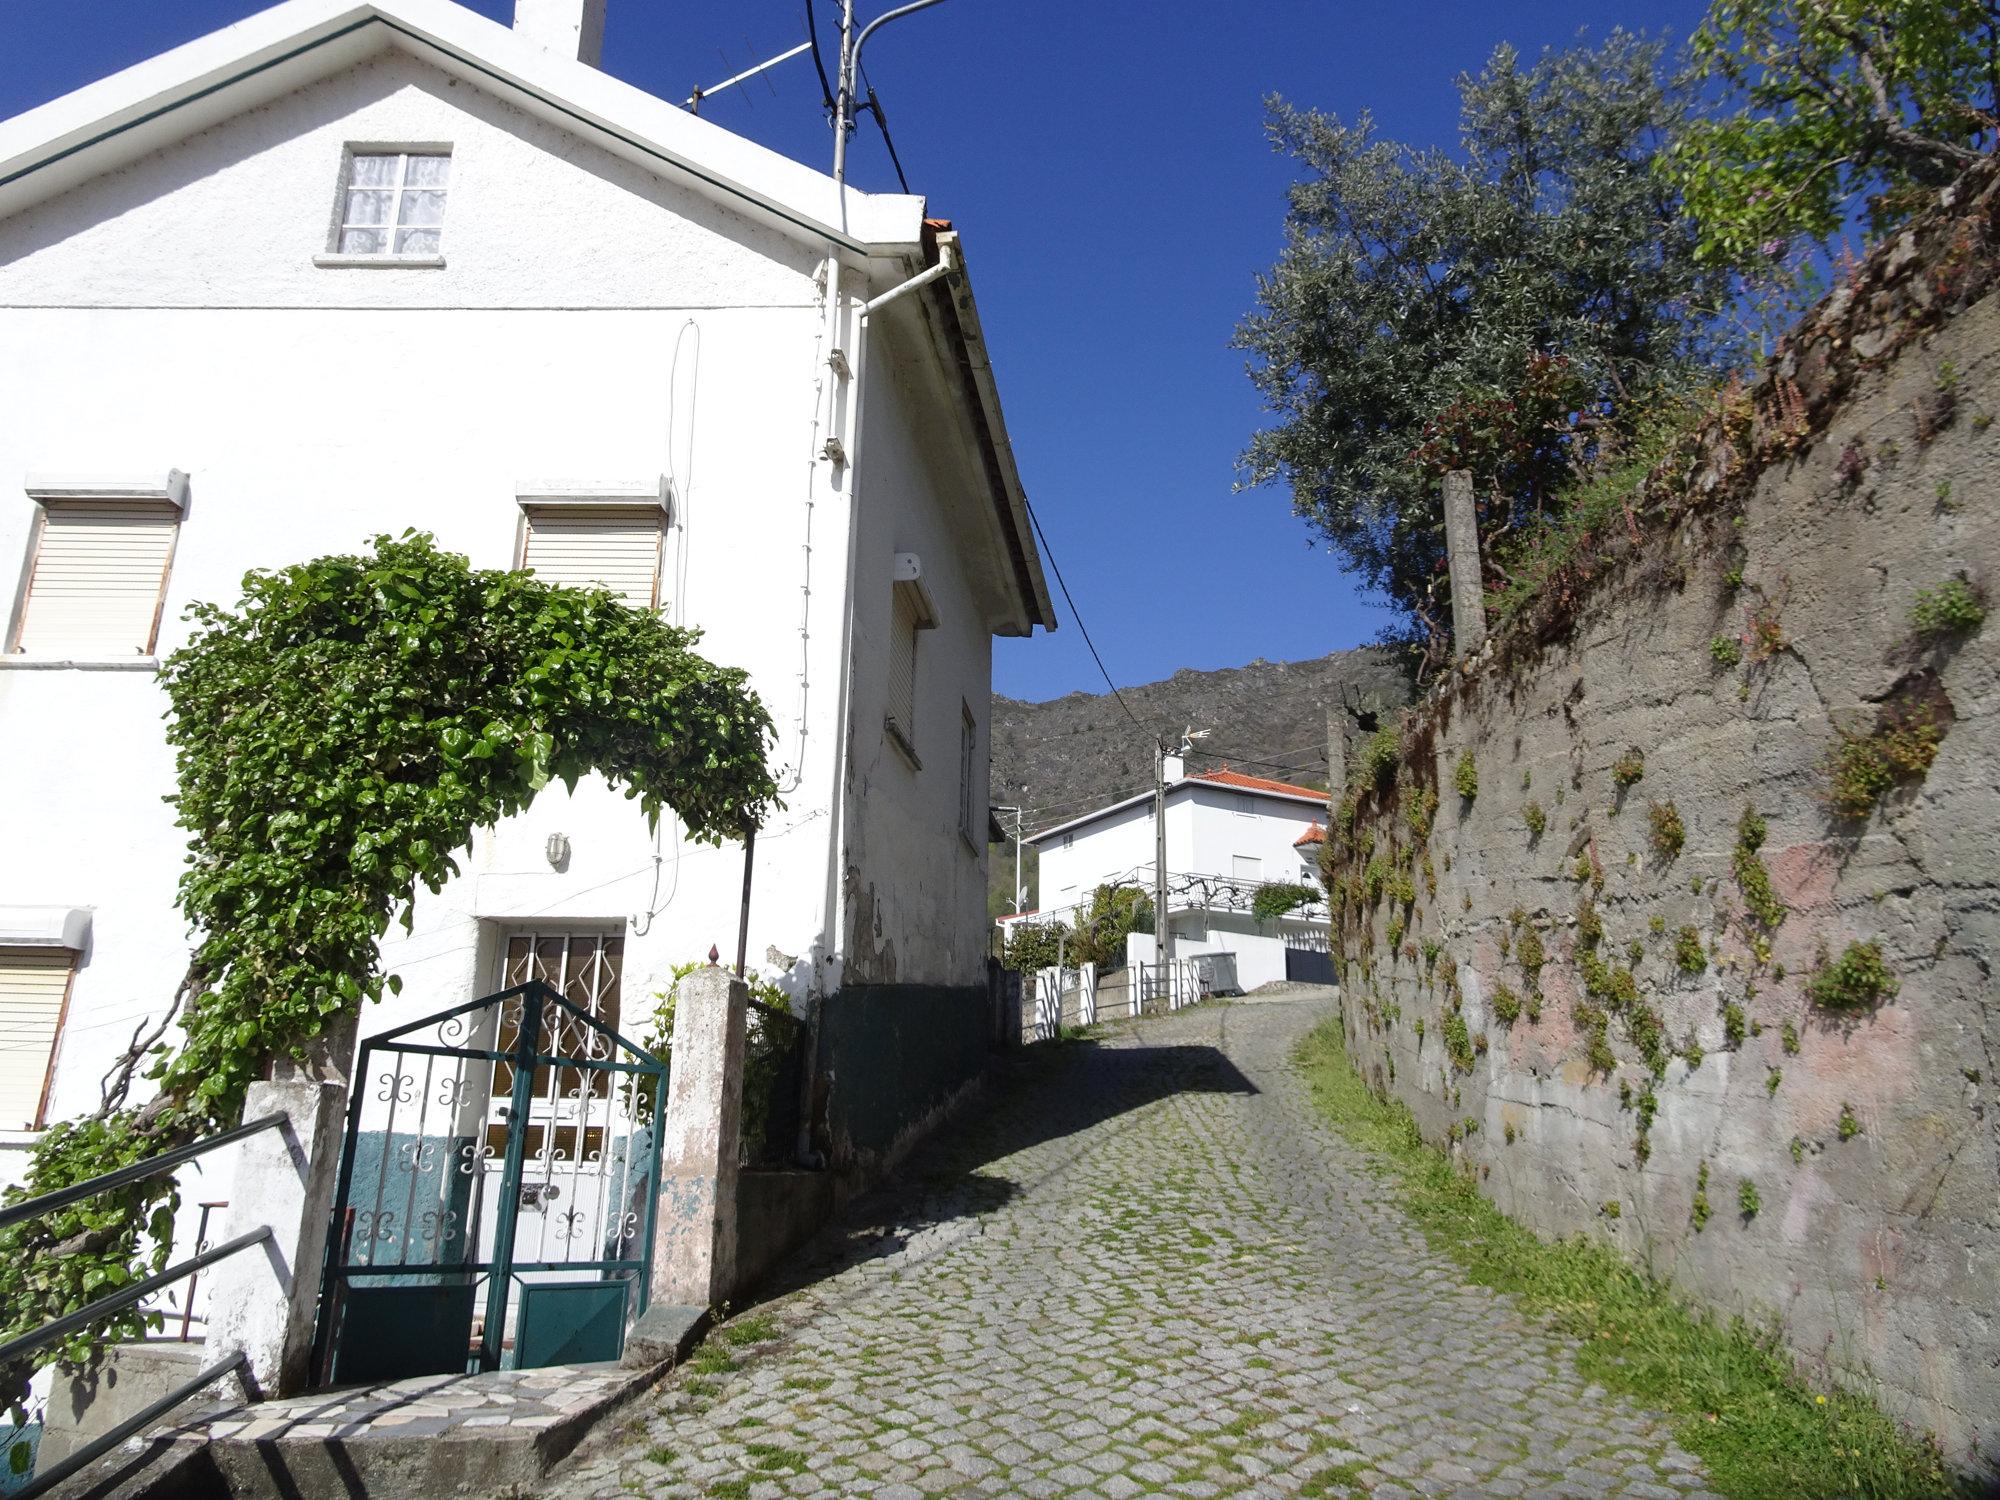 Manteigas, Carvão-Route, Wanderung, Rundwanderung, Serra da Estrella Portugal